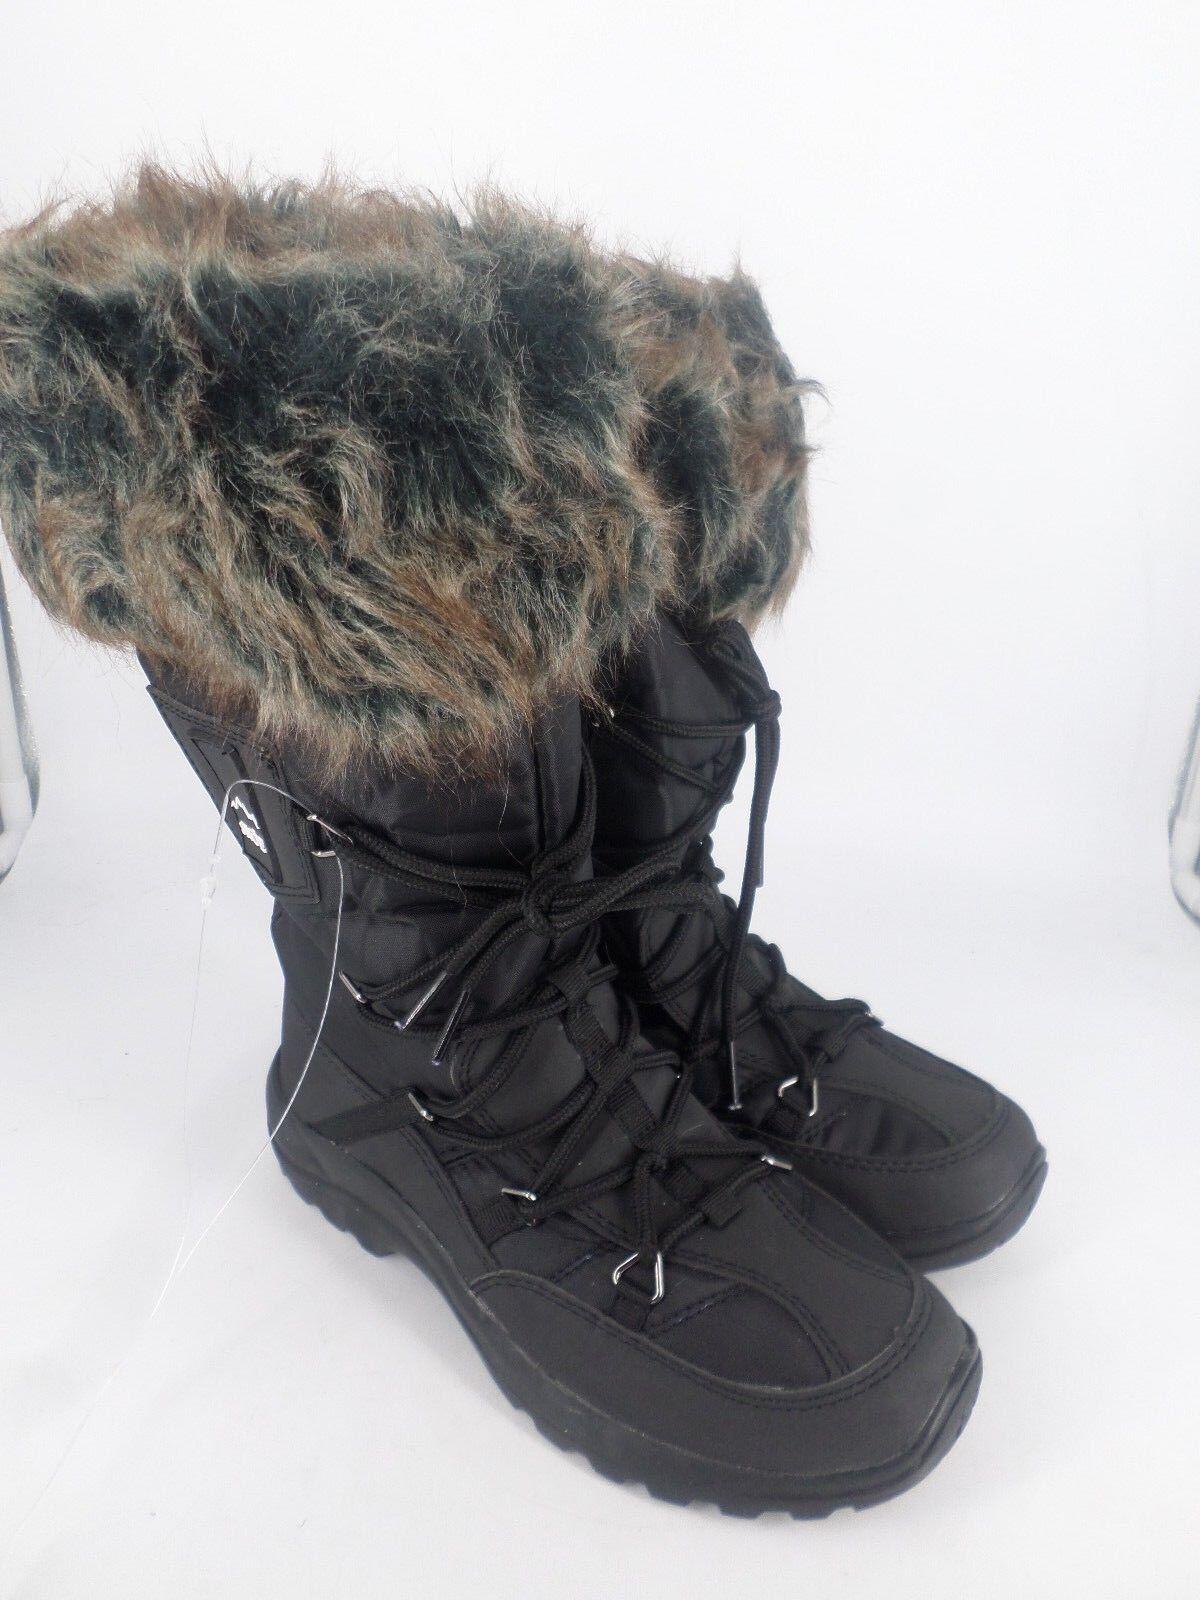 SNOE Señoras Ribete De Piel Negro Botas De Nieve LN084 mm 03